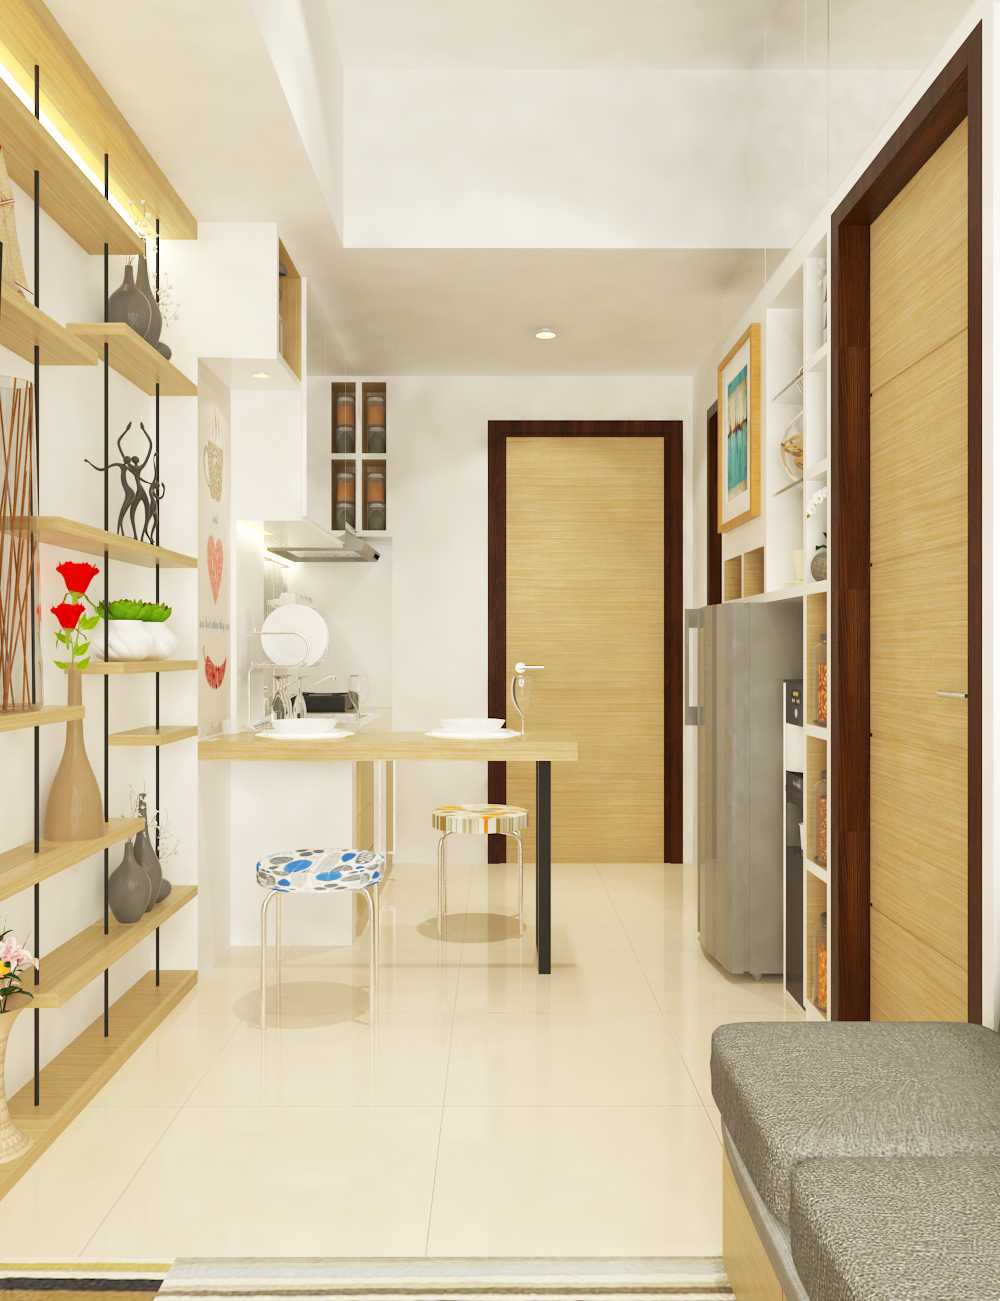 Miv Architects (Ar. Muhammad Ikhsan Hamiru, Iai & Partners) Interior Design Of Apartment Unit Makassar, South Sulawesi, Indonesia Makassar, South Sulawesi, Indonesia Apartment Room Design Skandinavia  29139